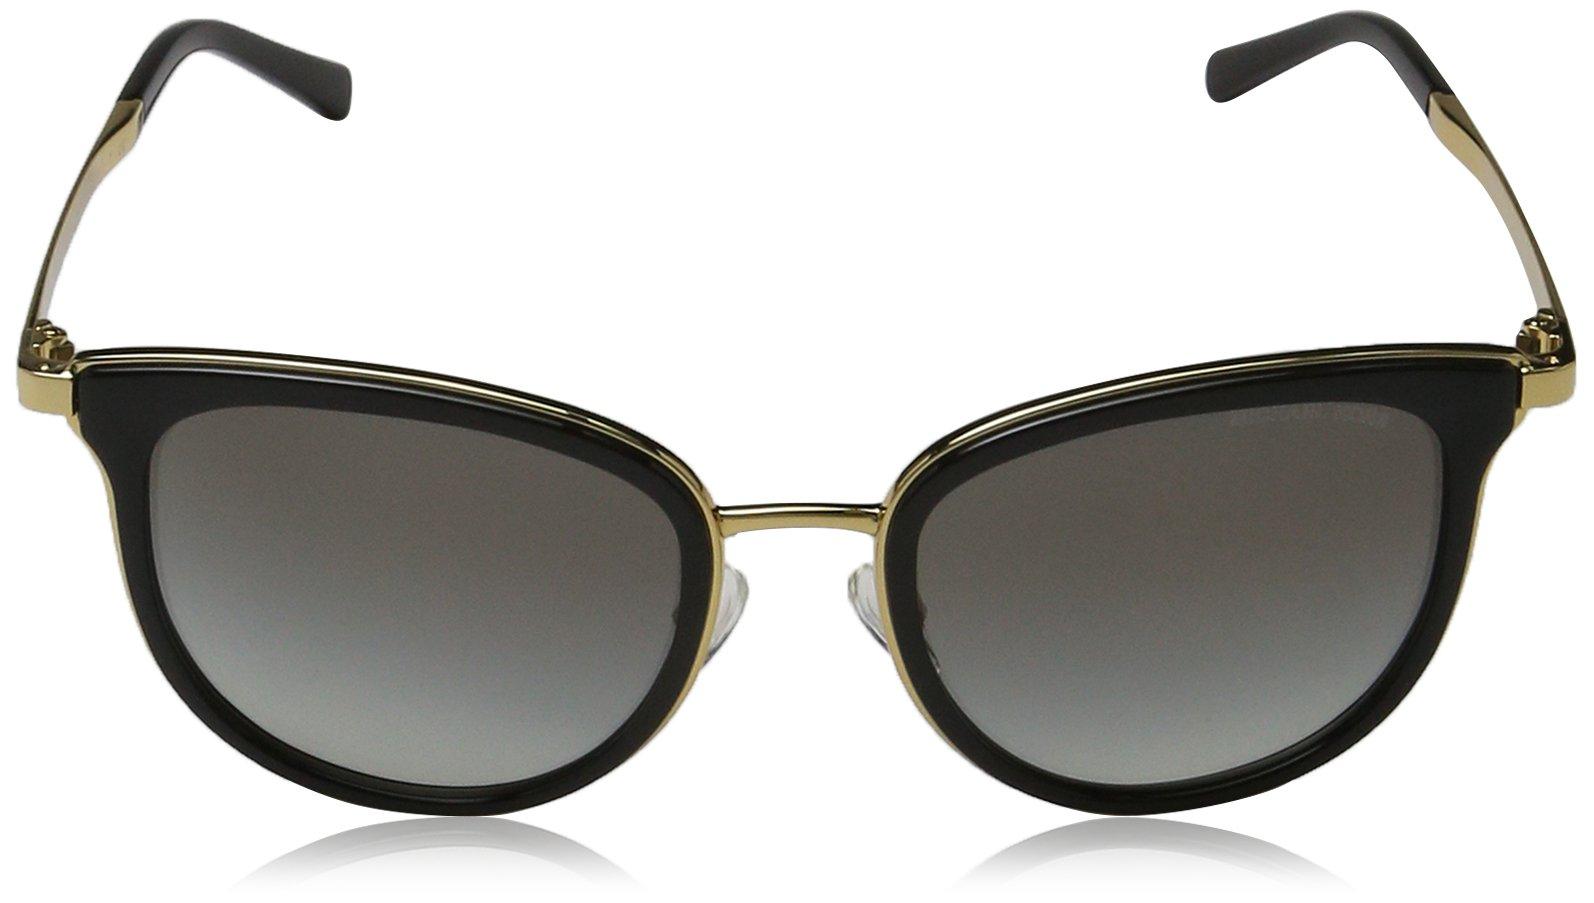 Michael Kors Women's Adrianna I MK1010 Black/Gold Sunglasses by Michael Kors (Image #2)